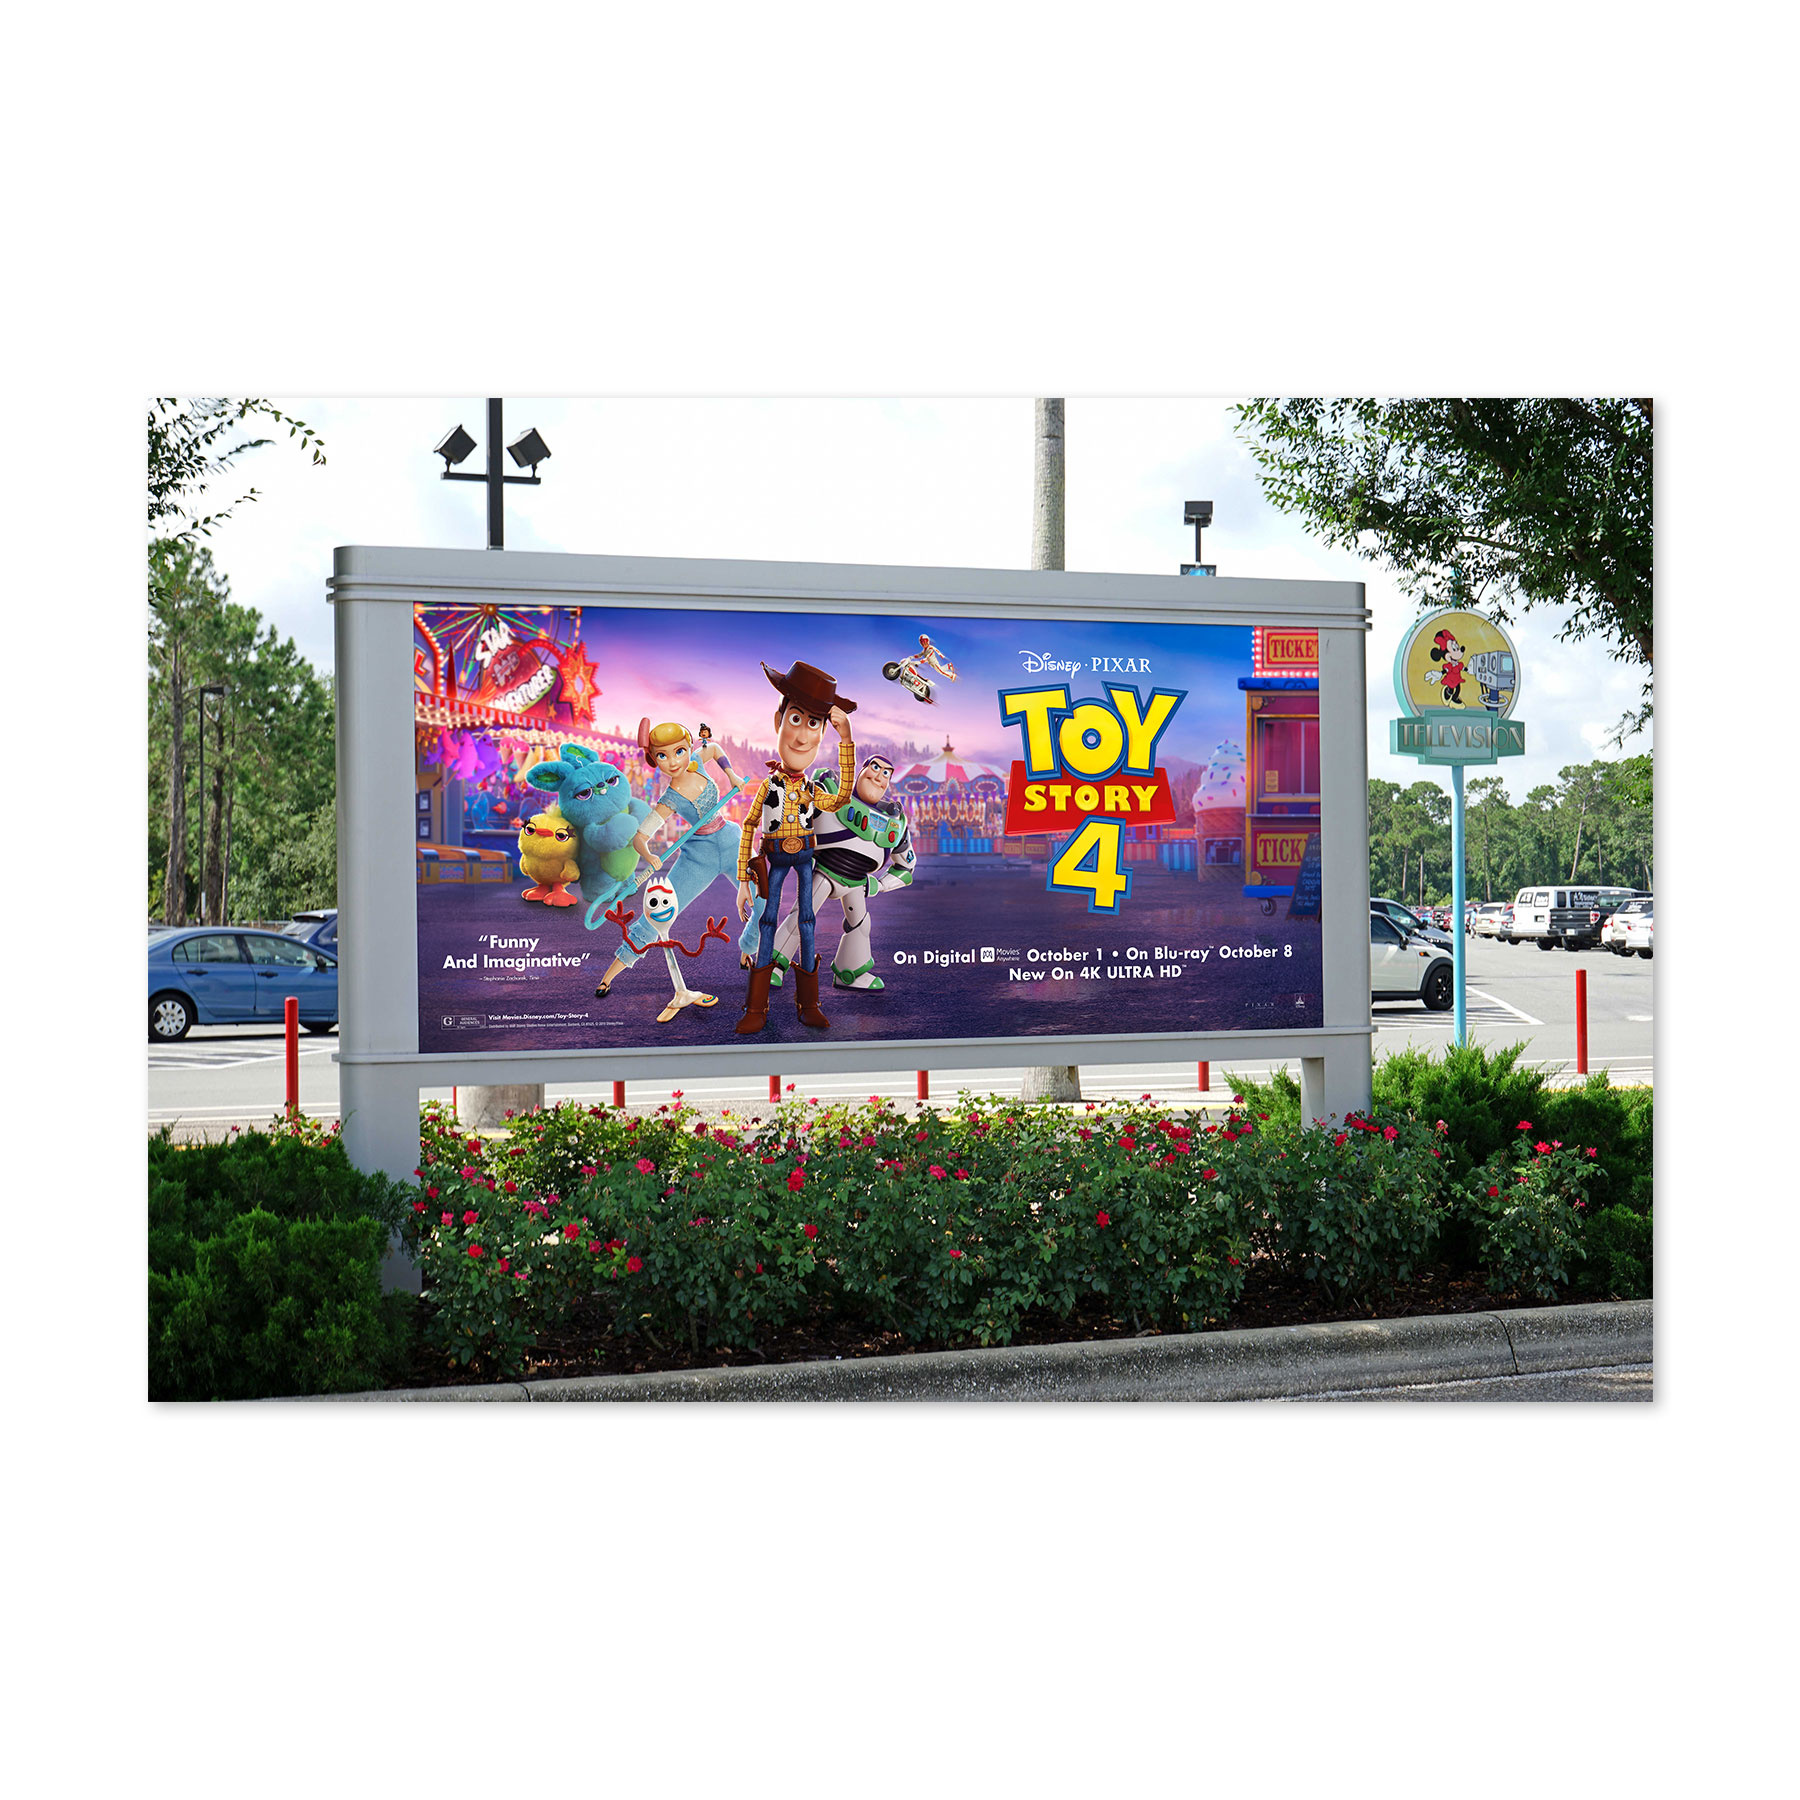 Toy Story 4 Billboard